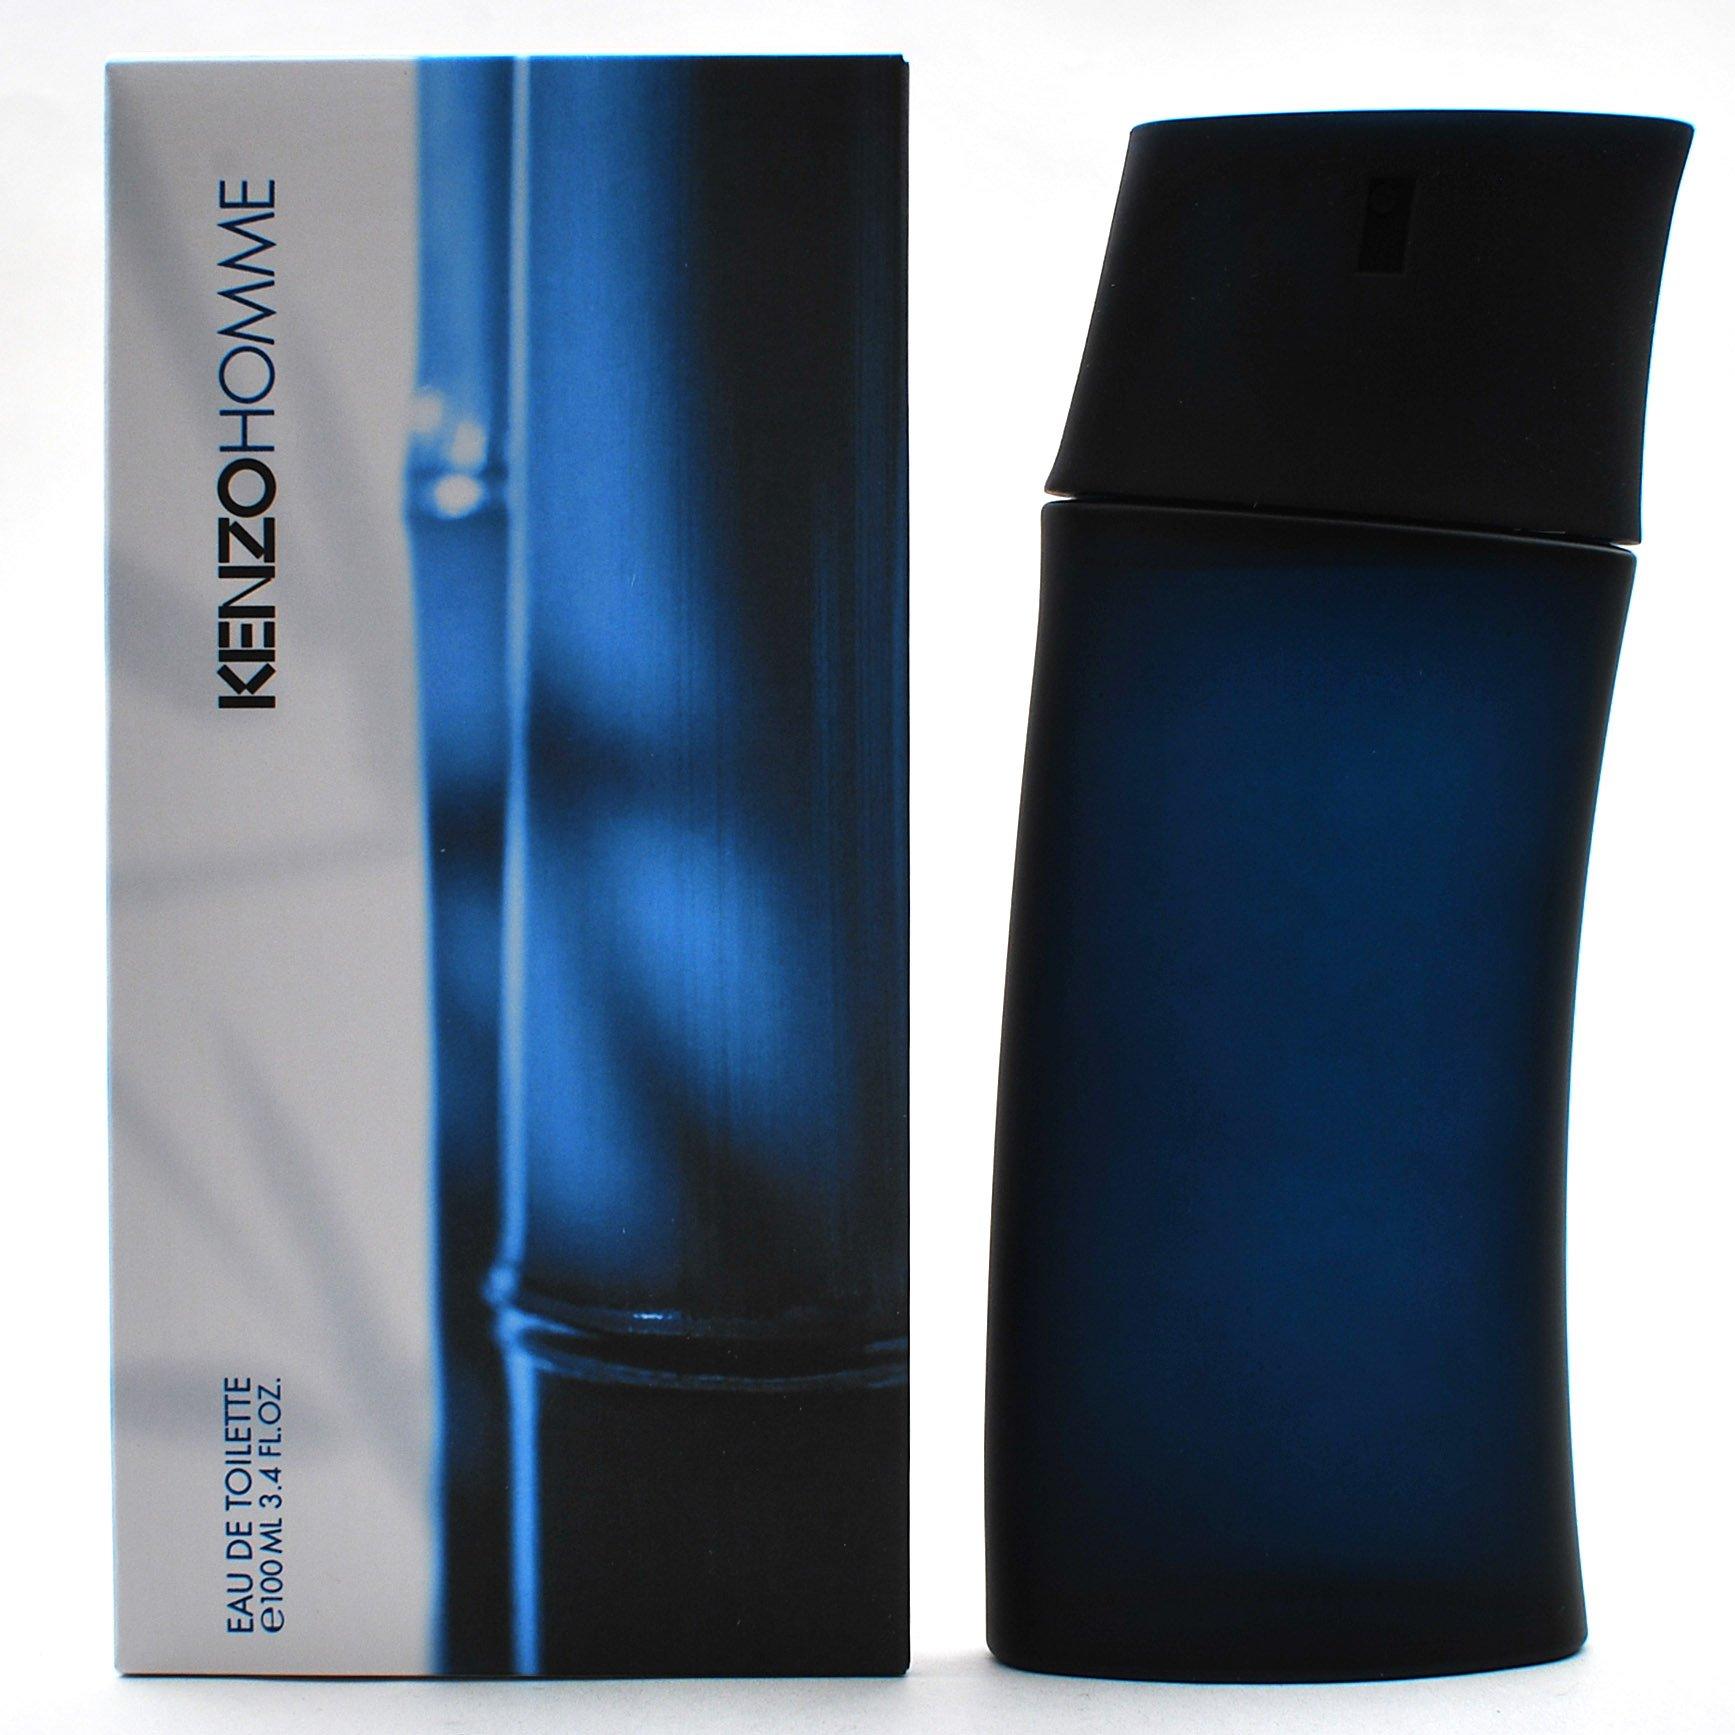 75bcb3409 Amazon.com : Kenzo Jungle By Kenzo For Men. Eau De Toilette Spray ...